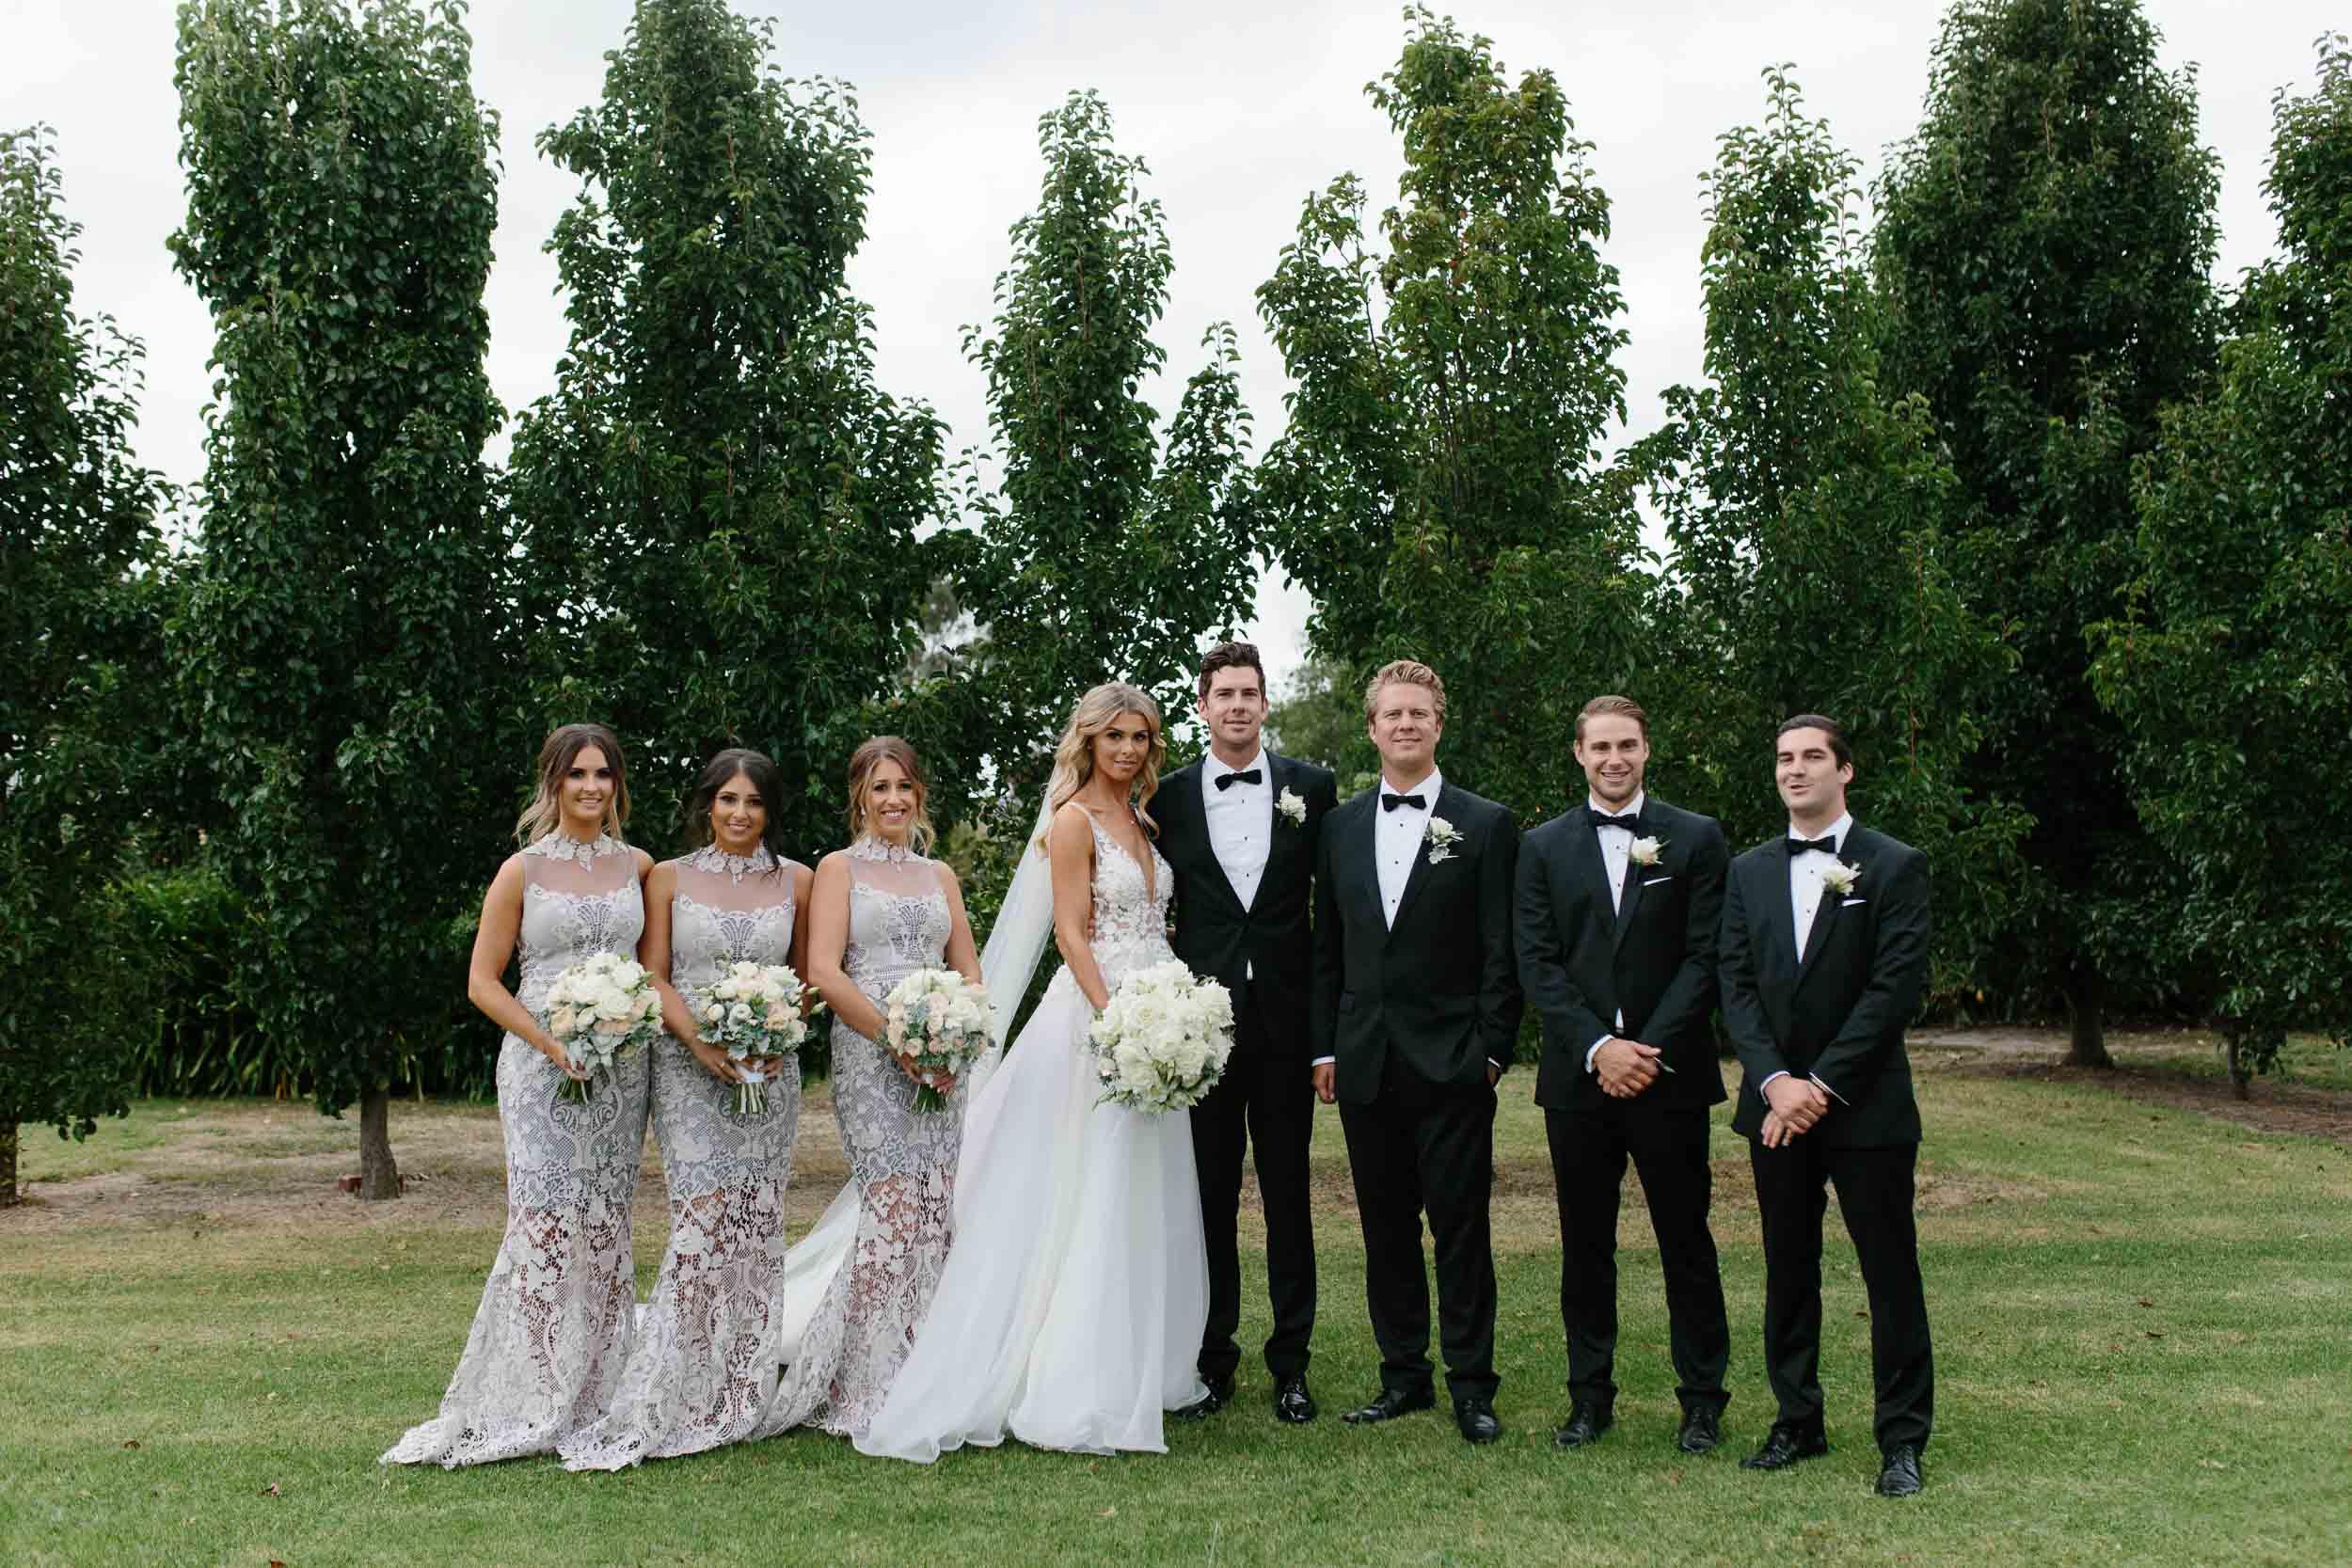 Kas-Richards-Mornington-Peninsula-Private-Property-Wedding-Marianna-Hardwick-Gown-388.jpg